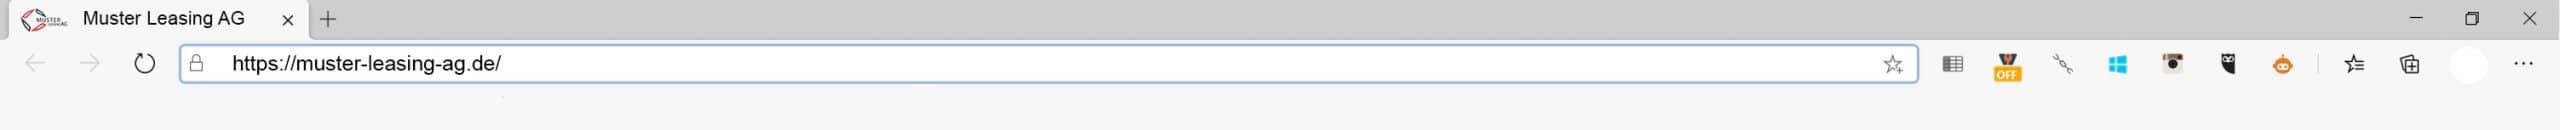 Browserleiste